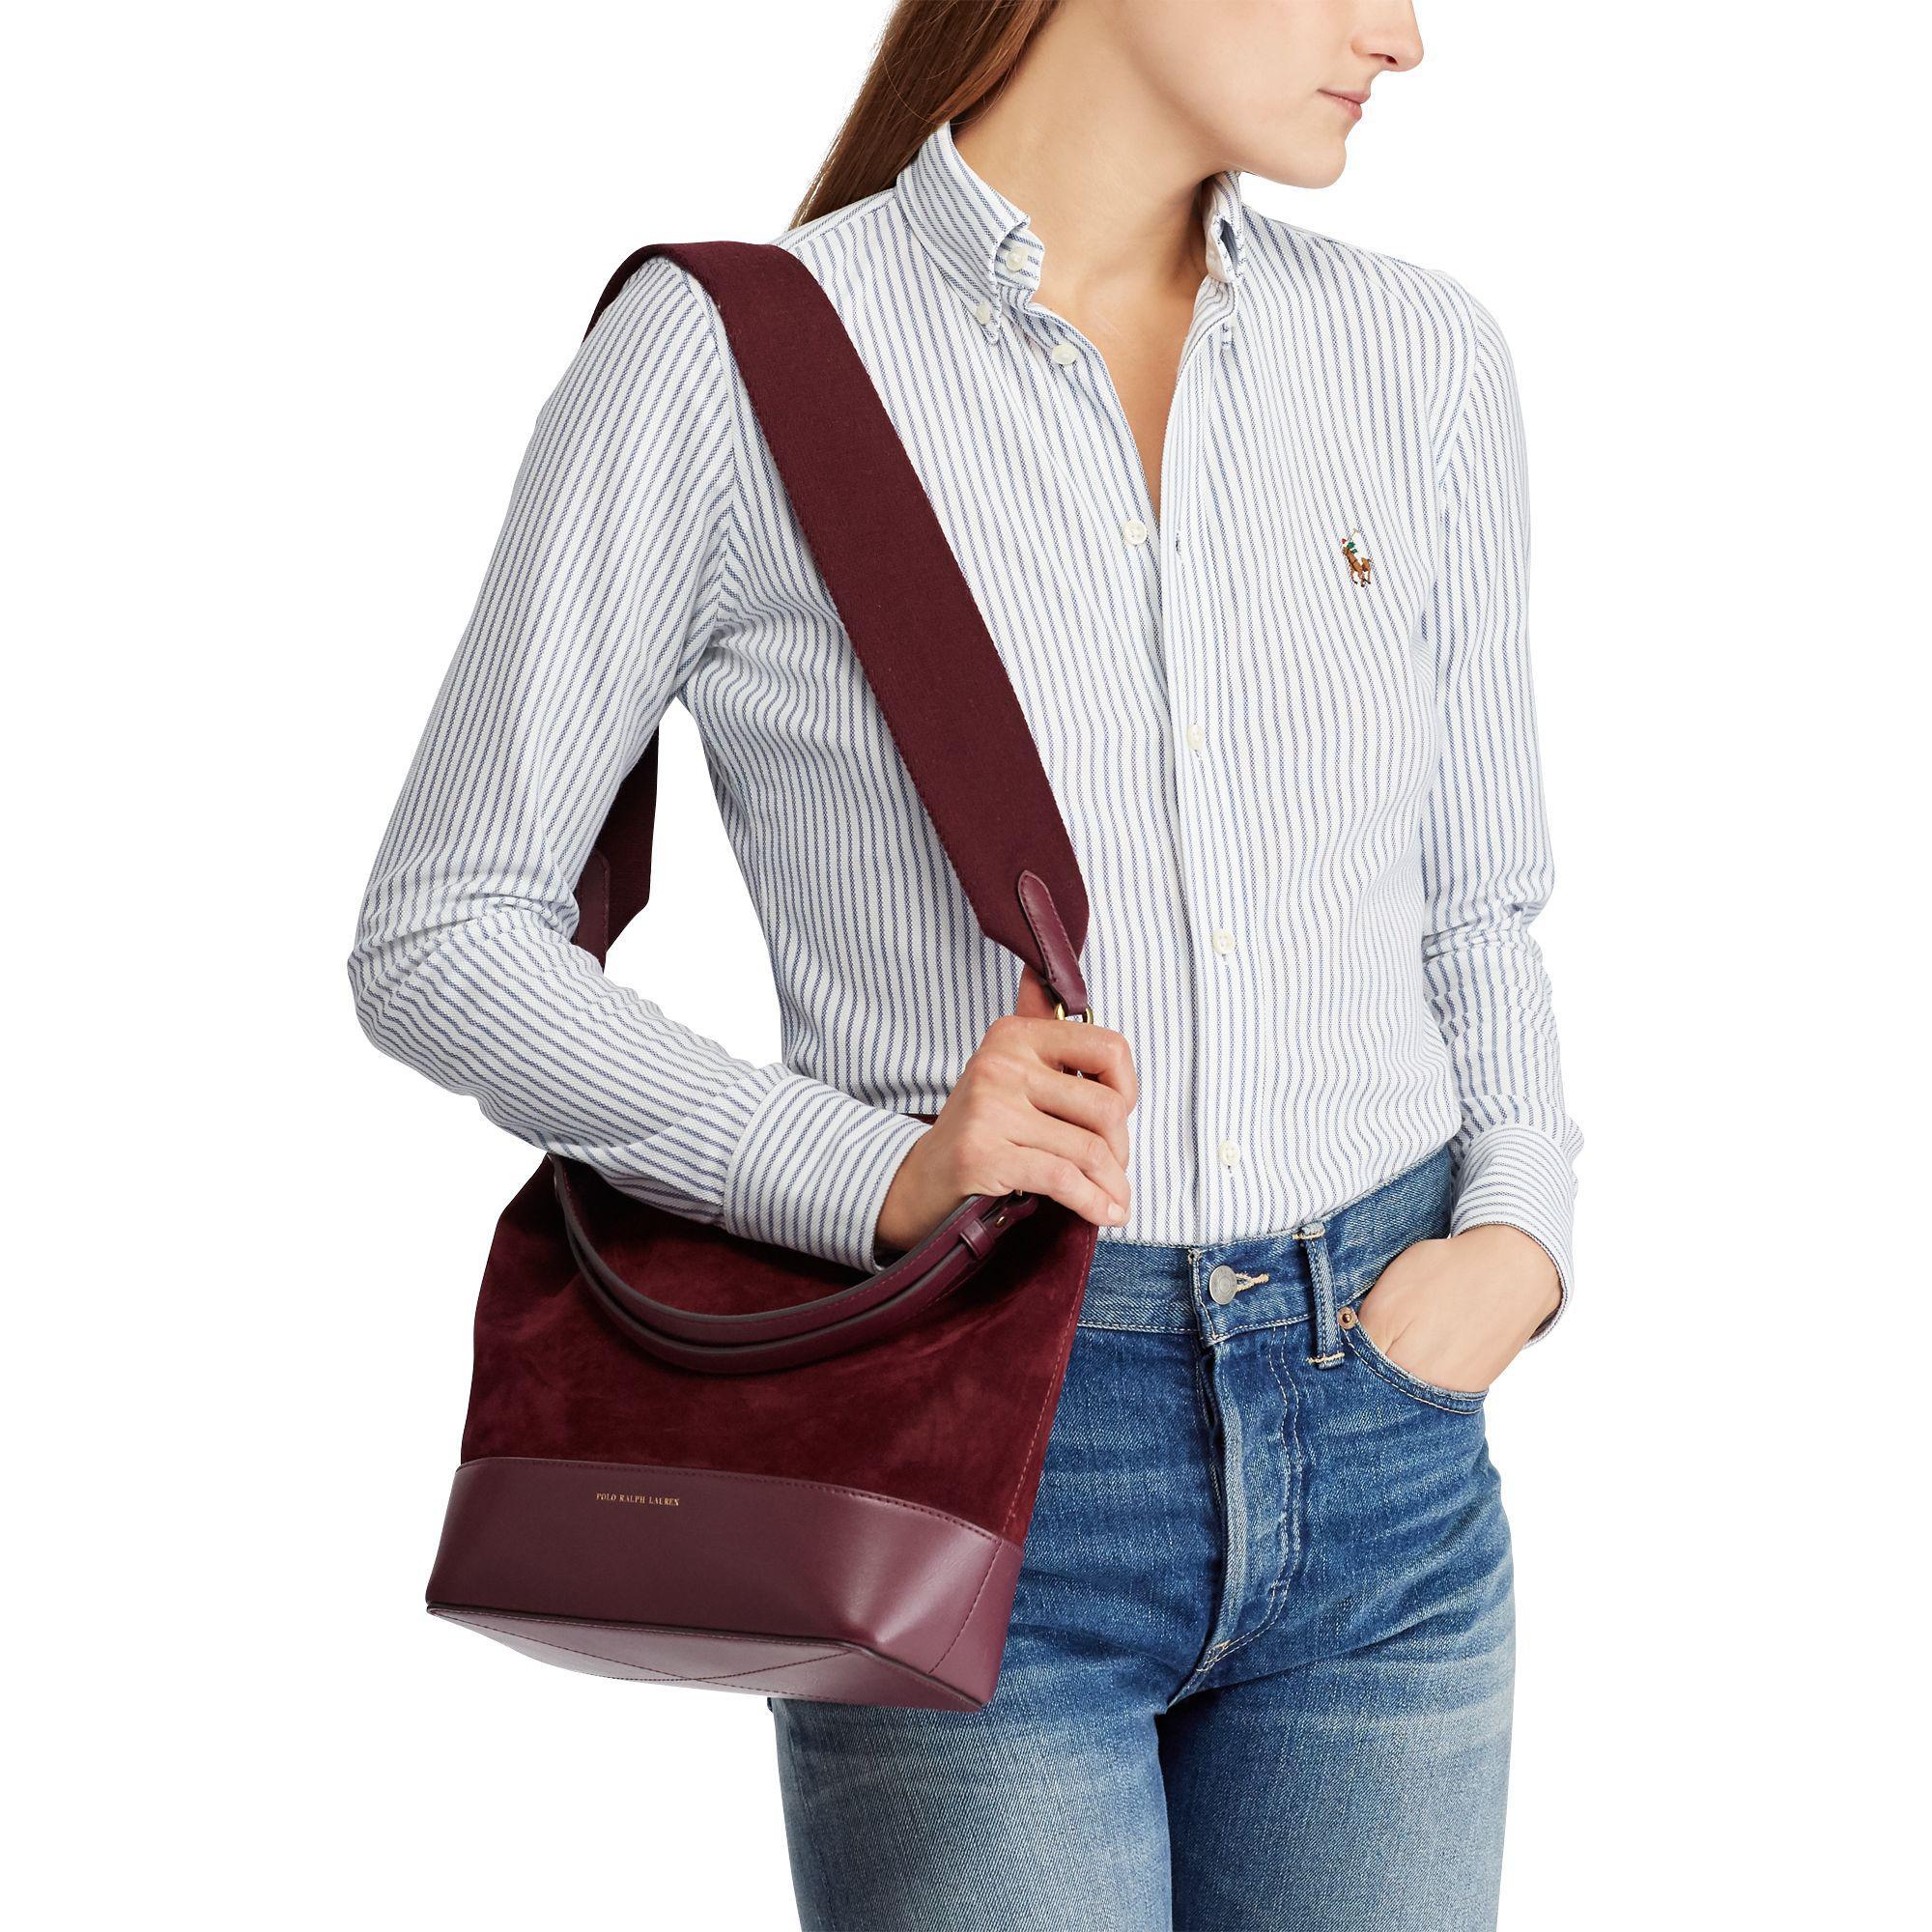 e6e6c9ad43 Lyst - Polo Ralph Lauren Small Suede Leather Hobo Bag in Purple